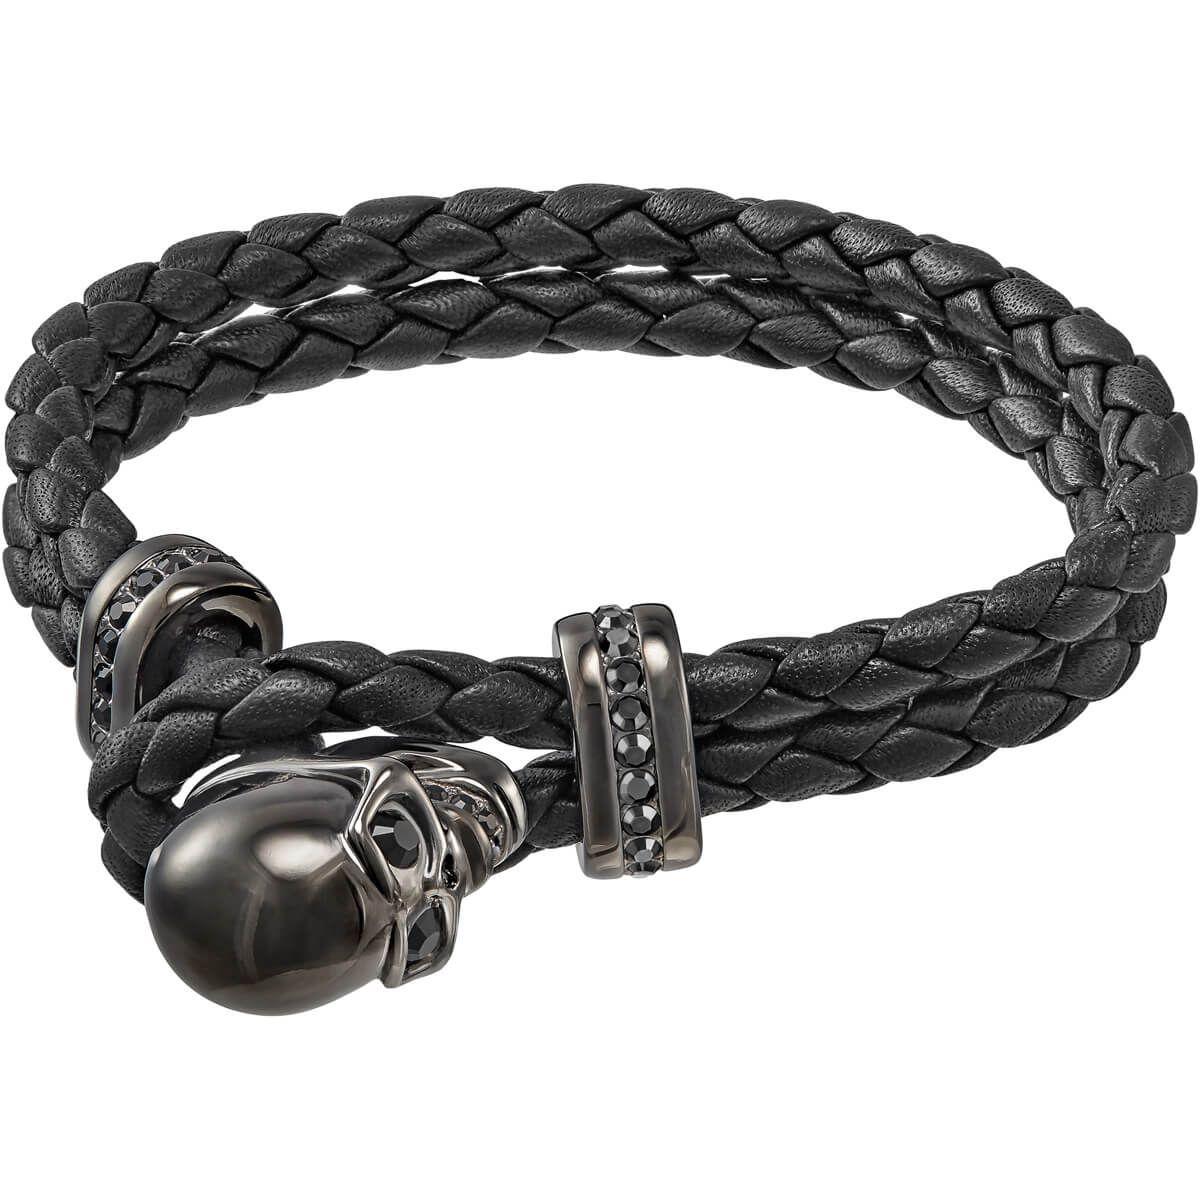 Fran bracelet leather black braided leather bracelet